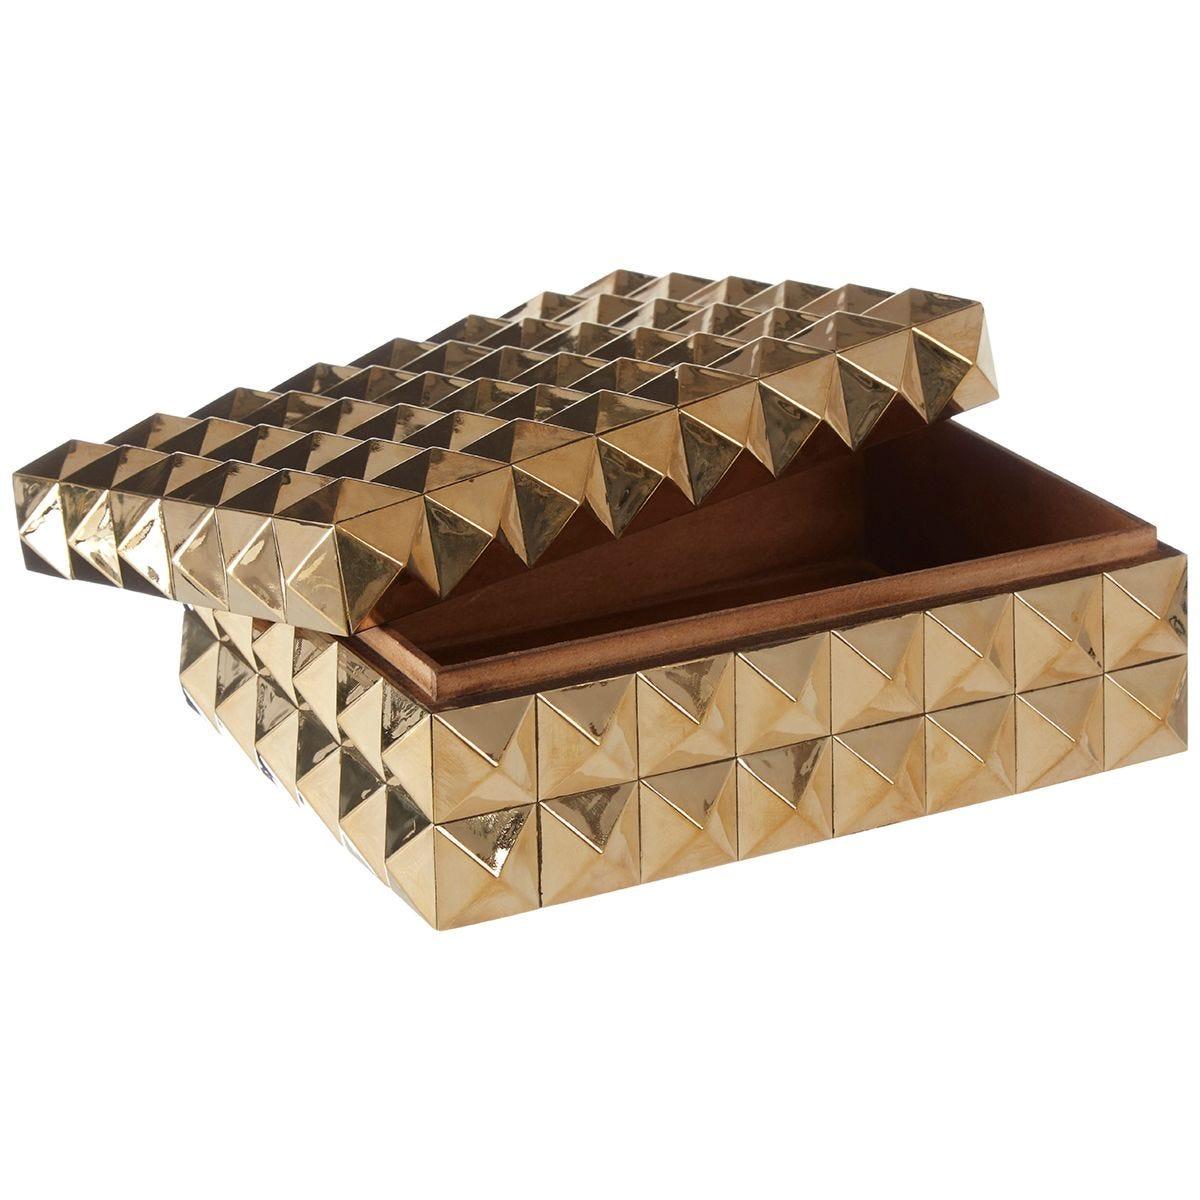 Premier Housewares Lexus Small Trinket Box with Pyramid Studs - Gold Finish